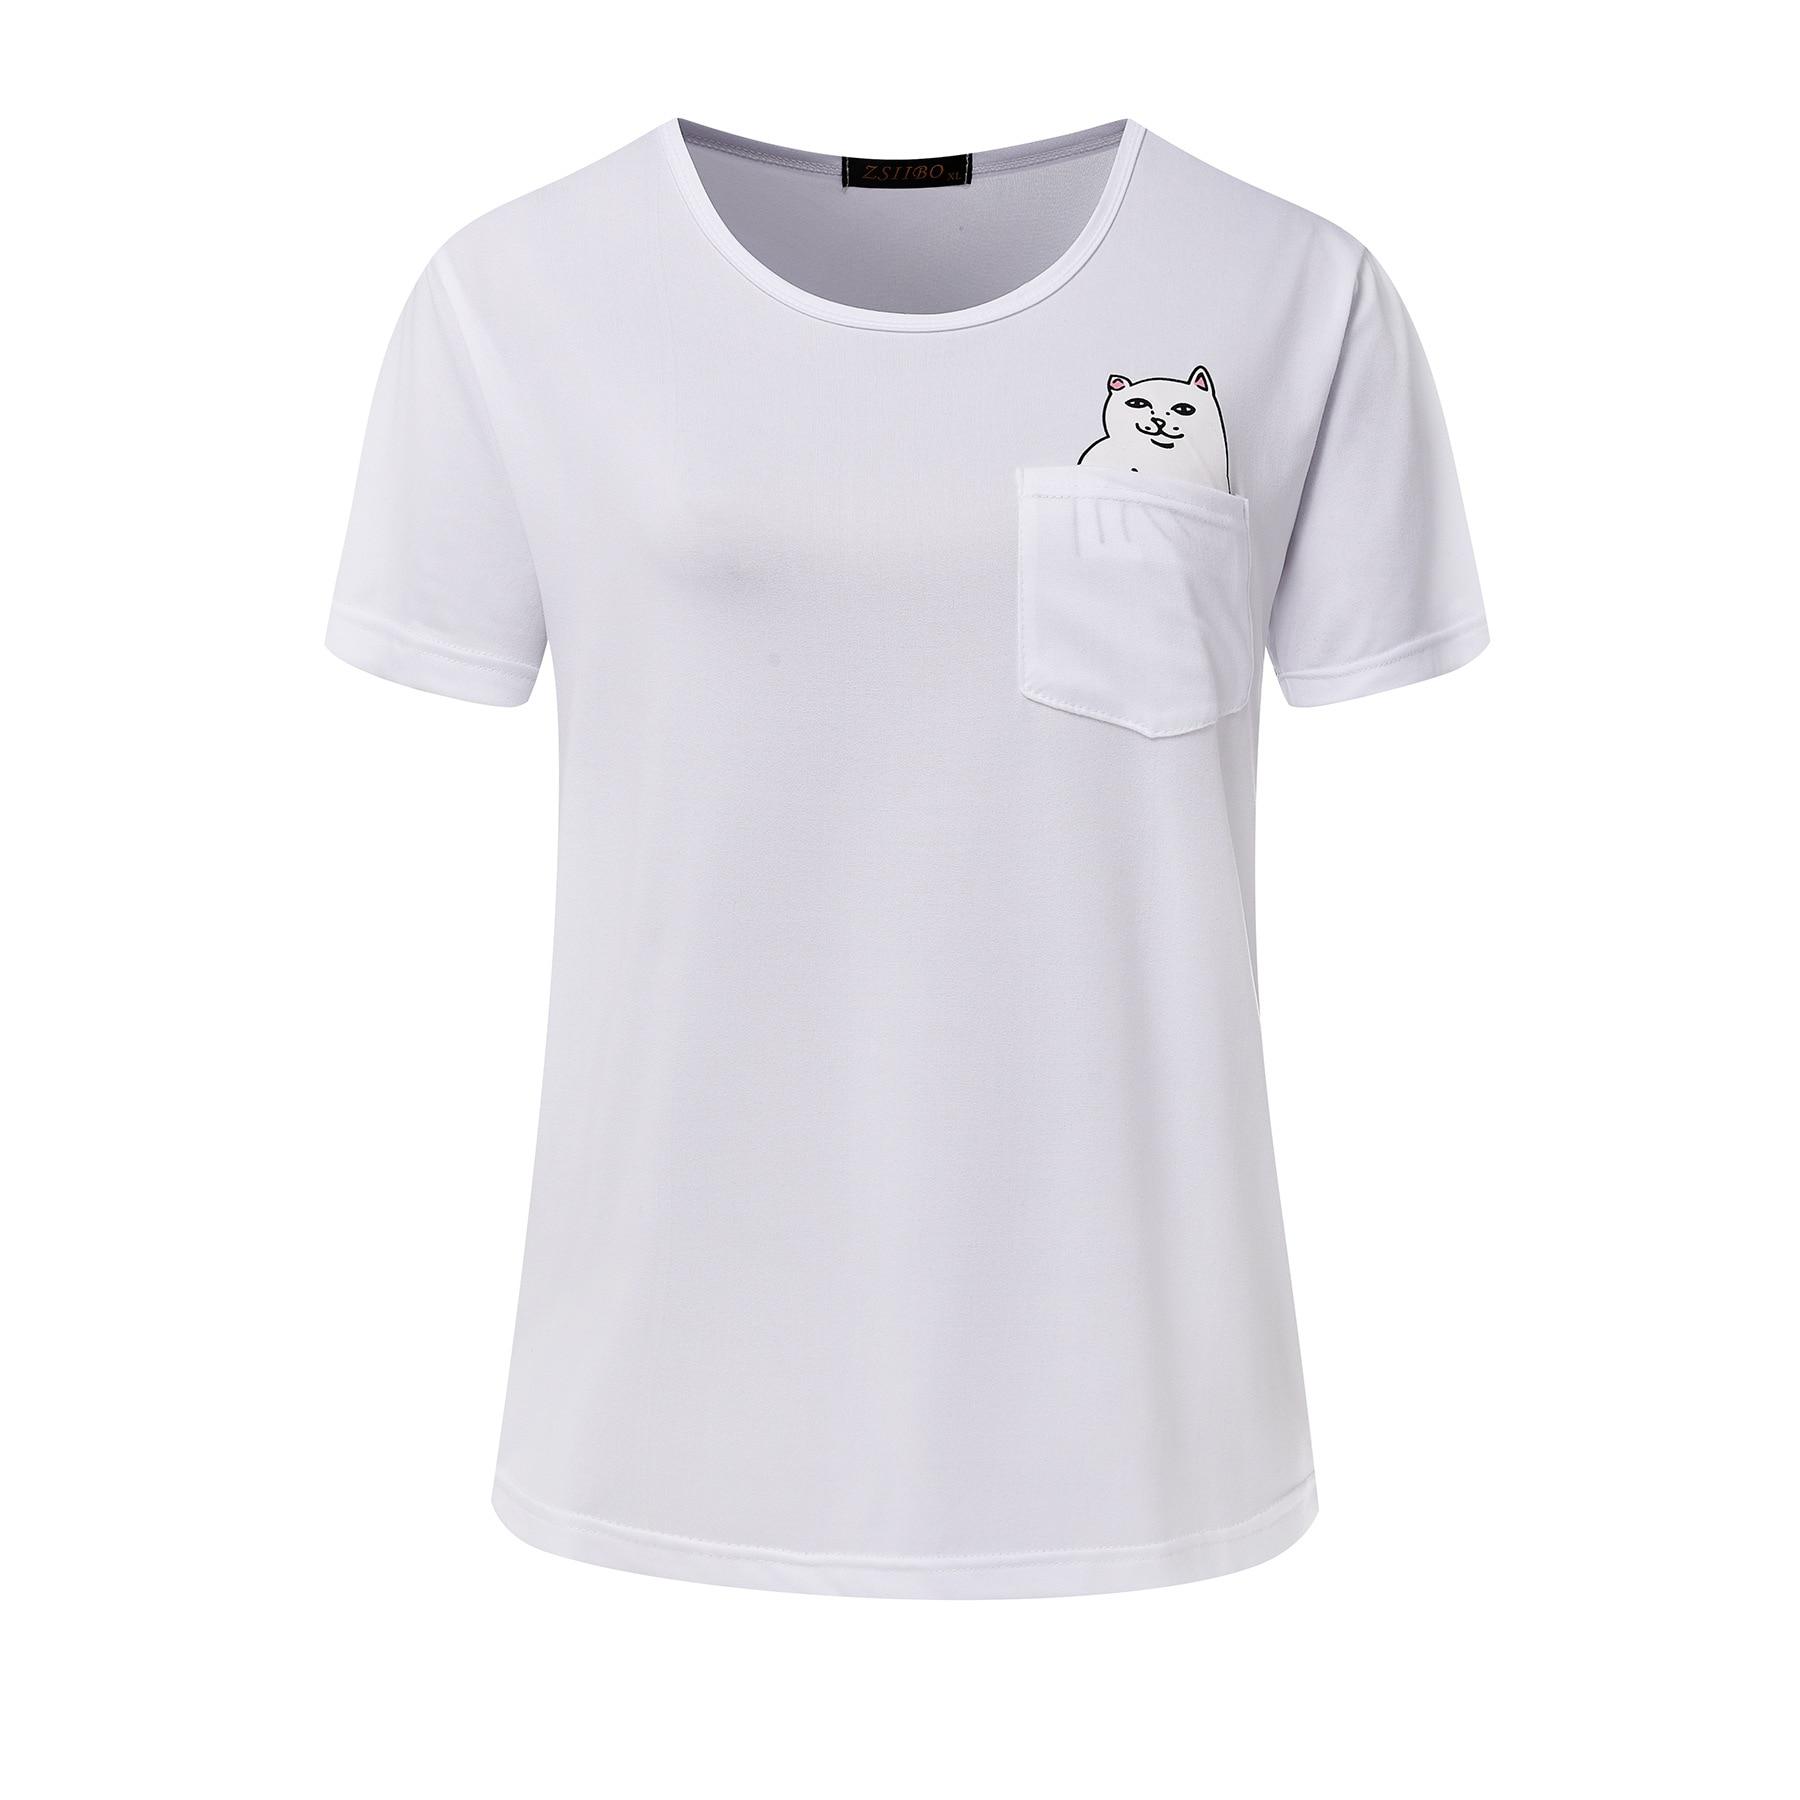 Online Get Cheap Pocket T Shirt Printing -Aliexpress.com | Alibaba ...